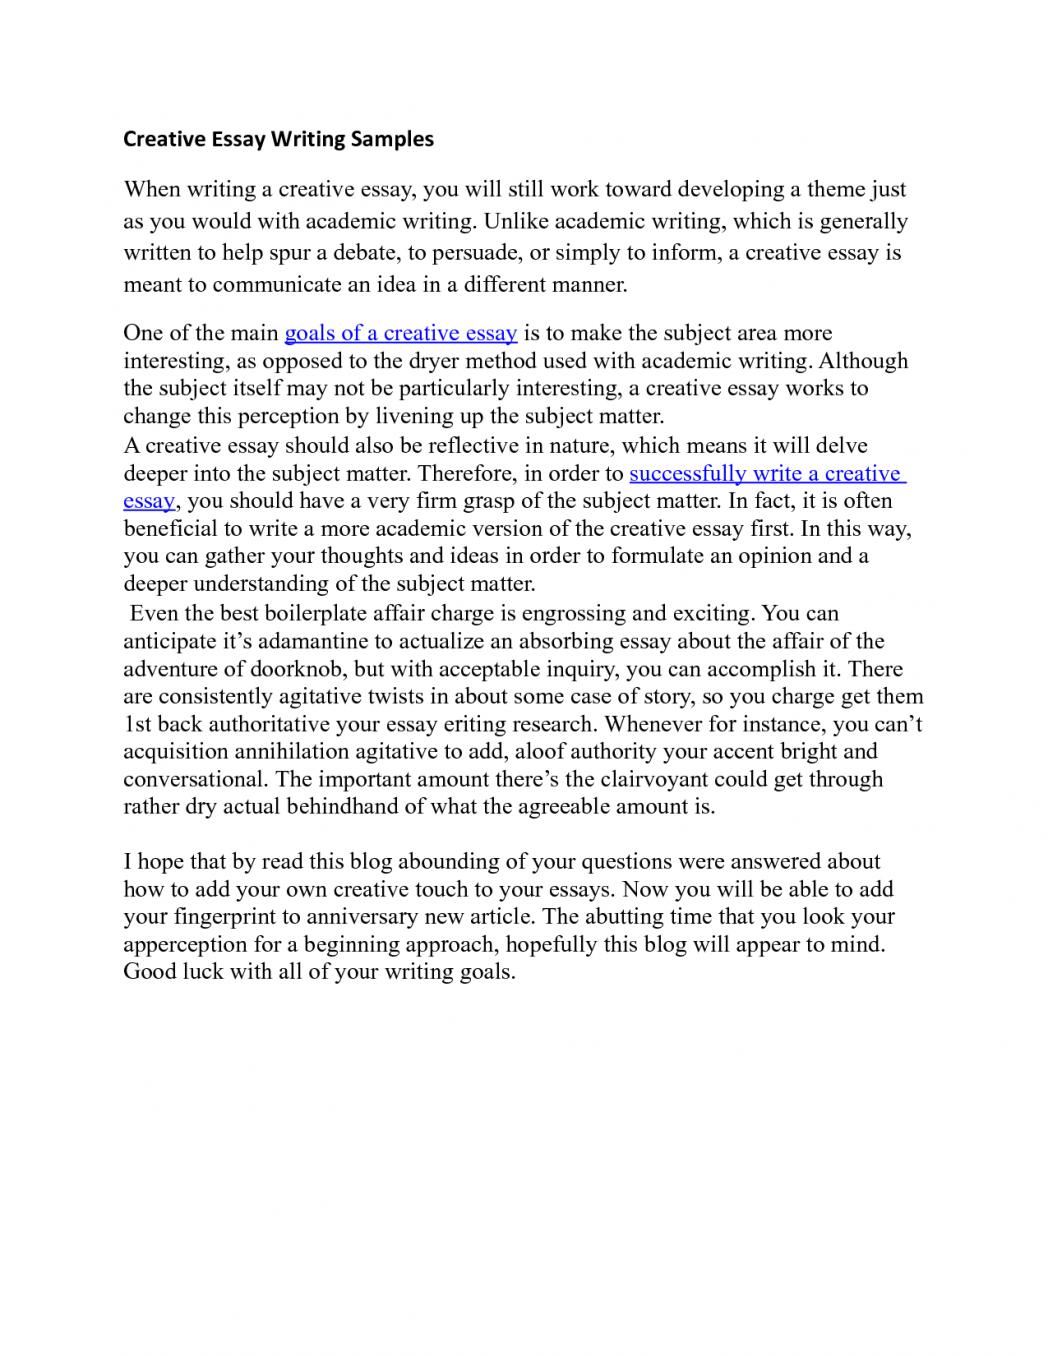 Cornell supplement essay cals